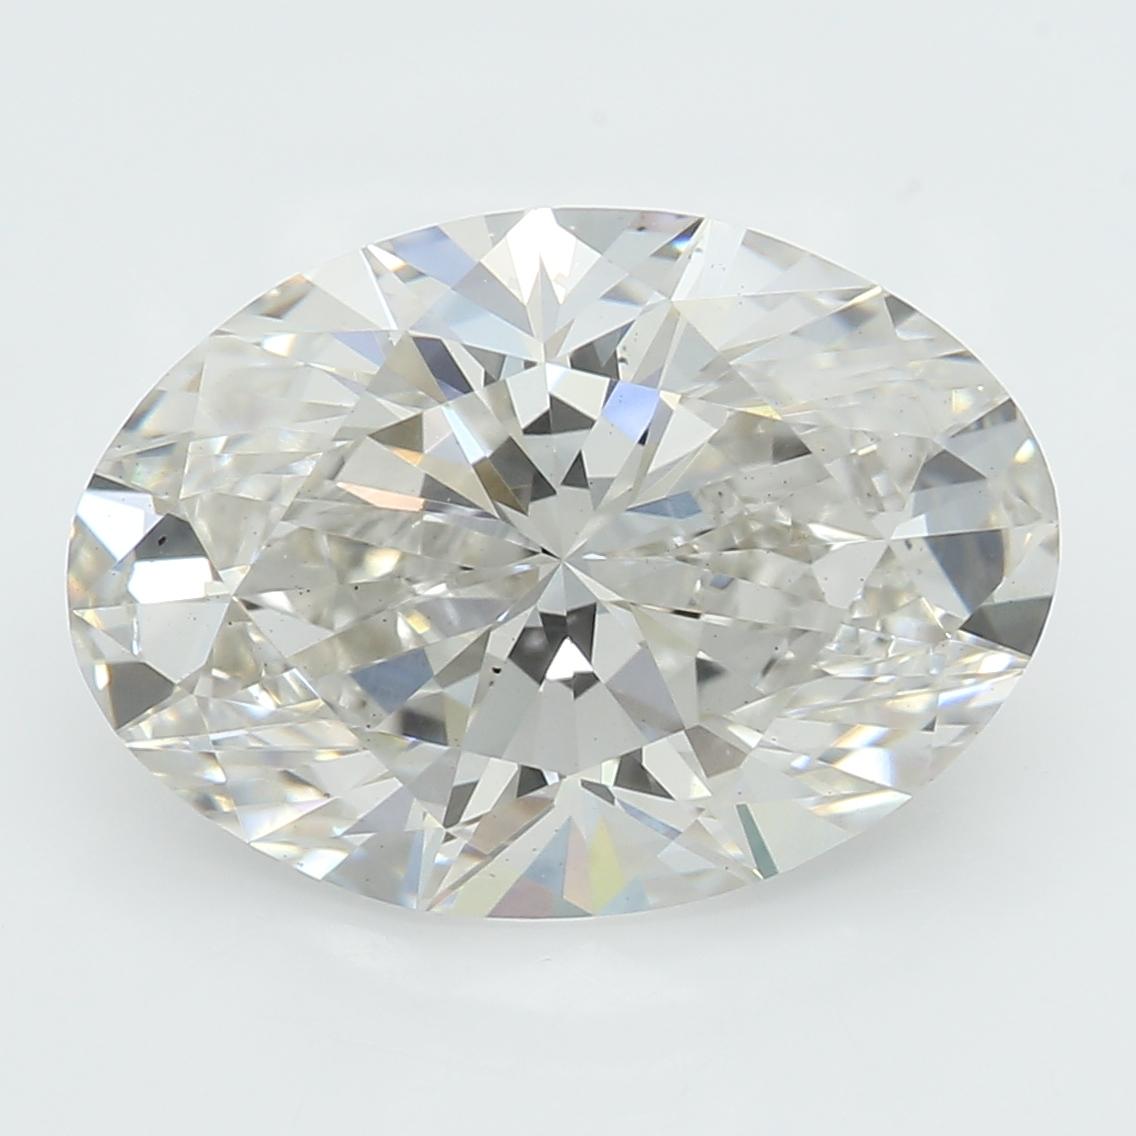 2.58 Carat I-VS2 Ideal Oval Diamond